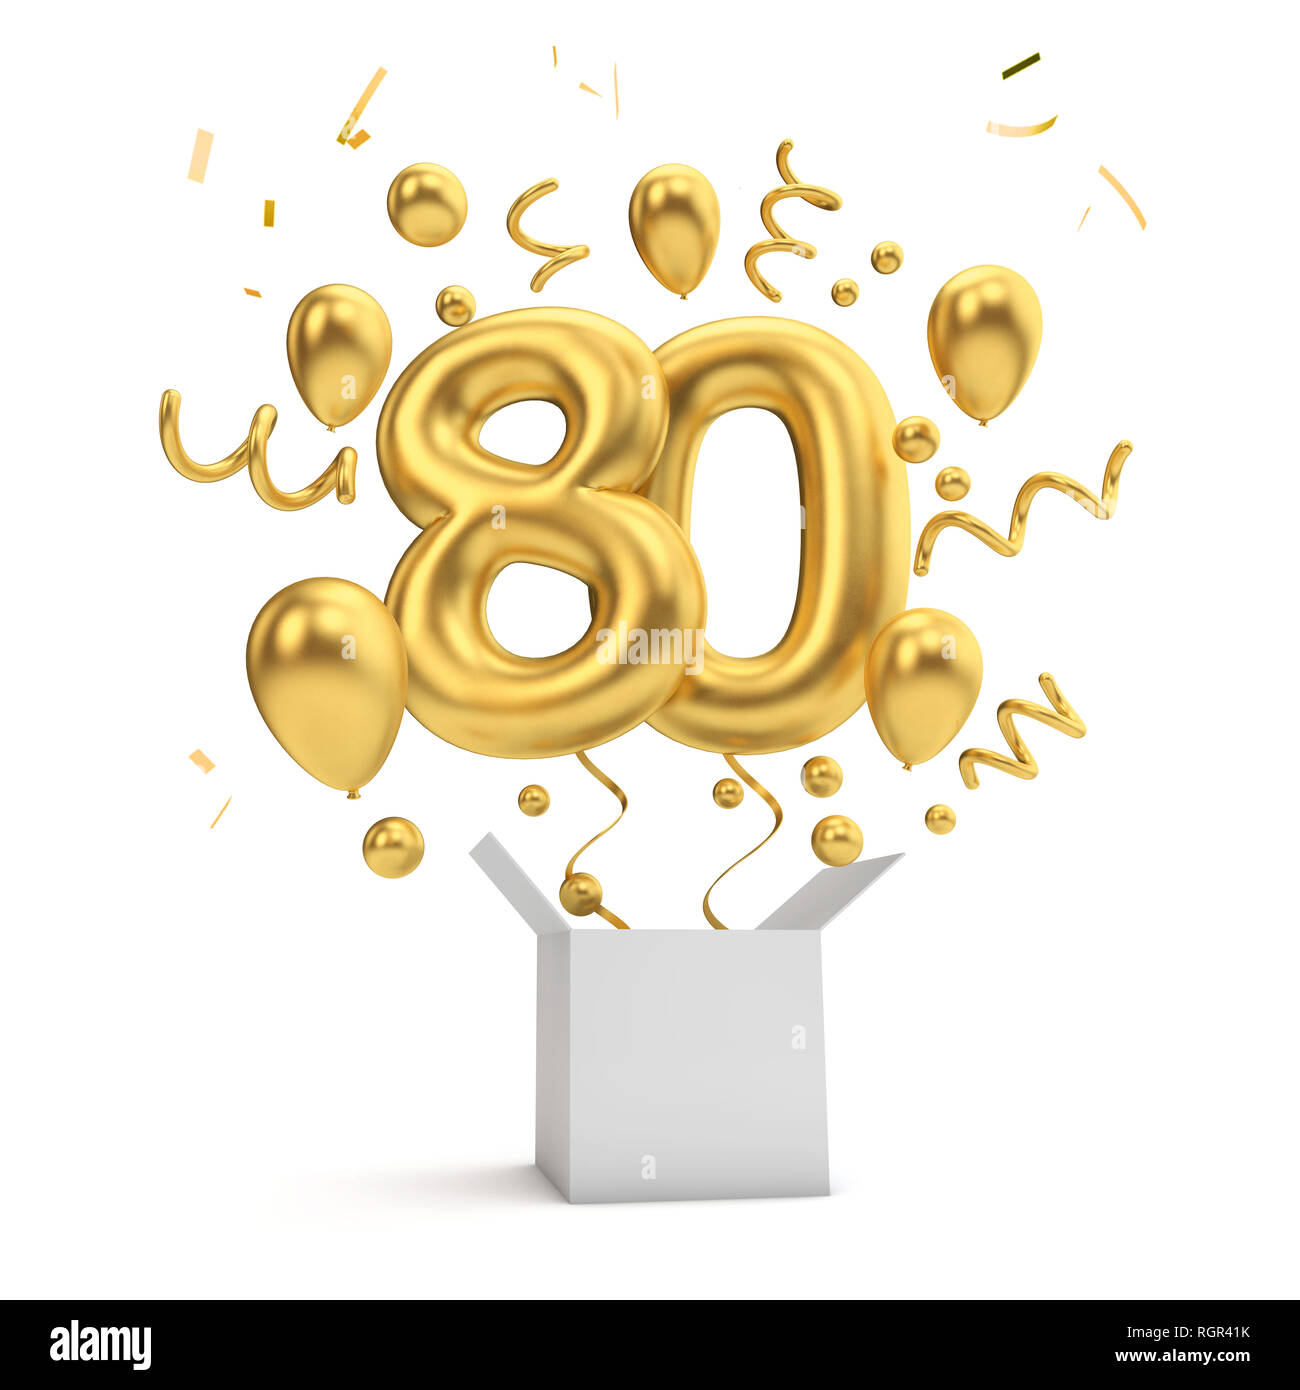 Happy 80th Birthday Gold Uberraschung Ballon Und Box 3D Rendering